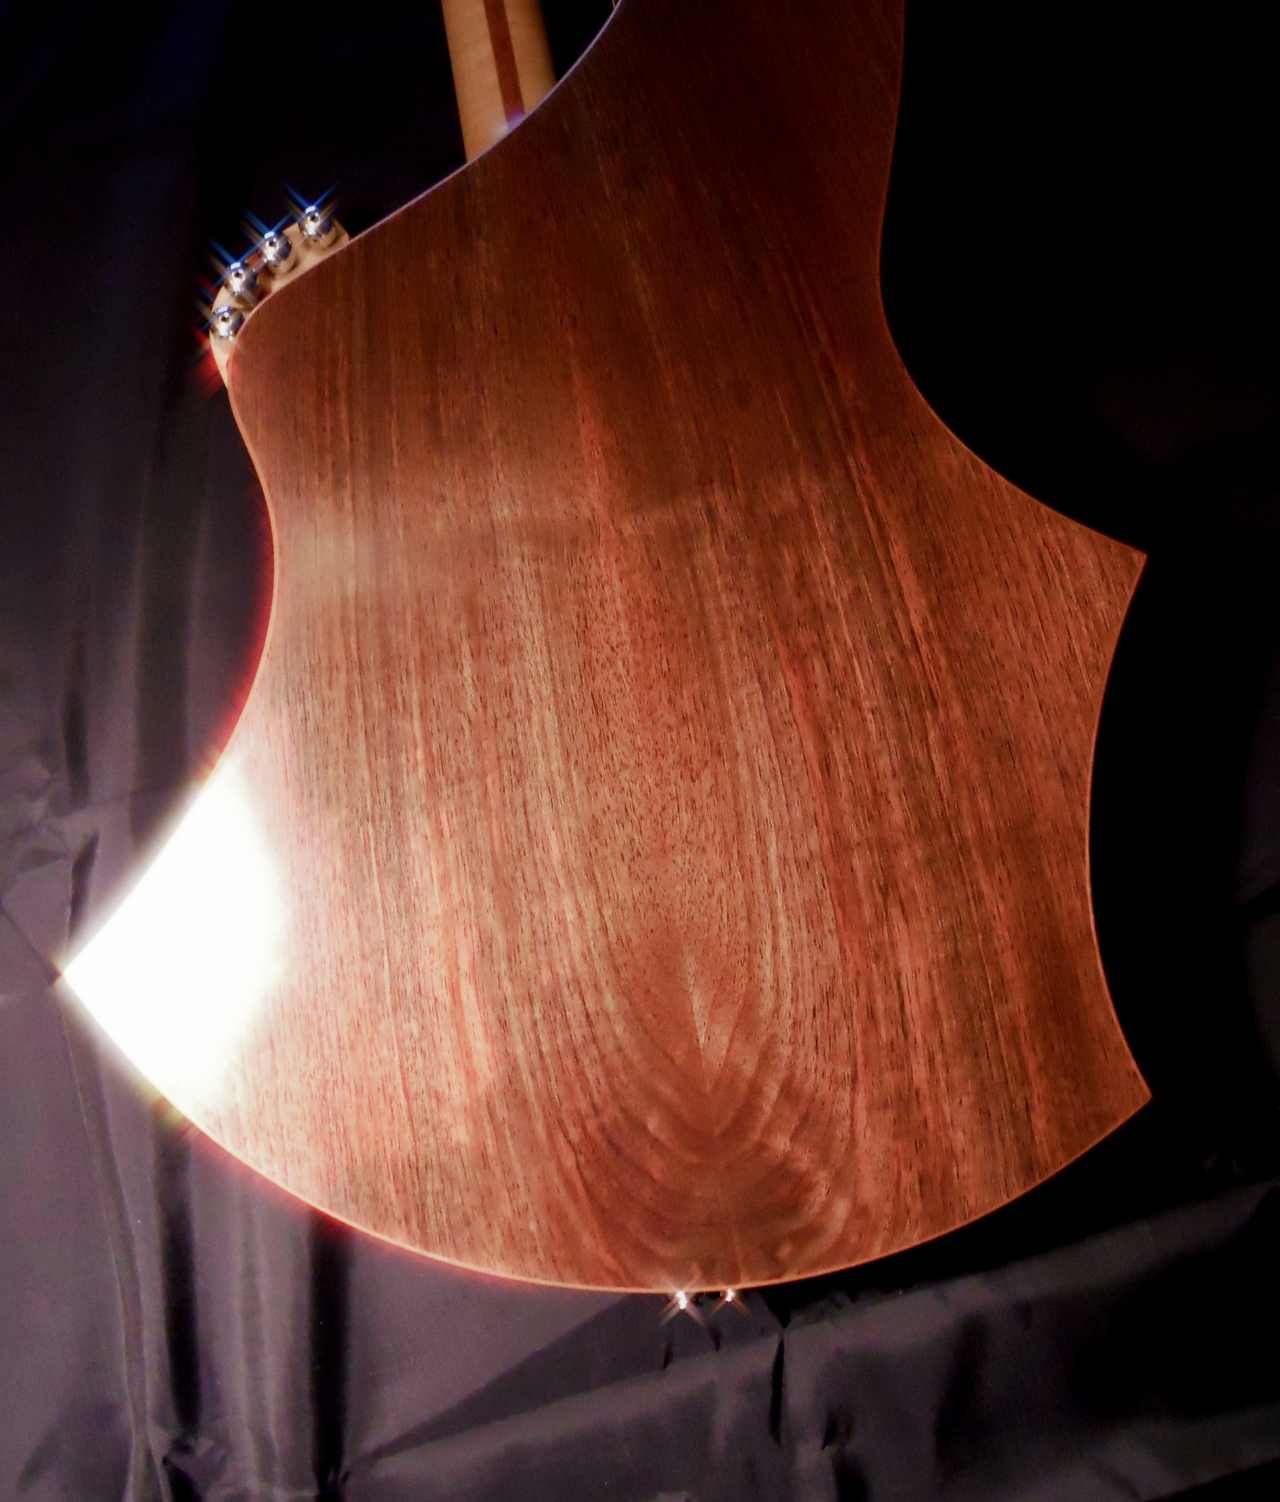 guitarback.jpg